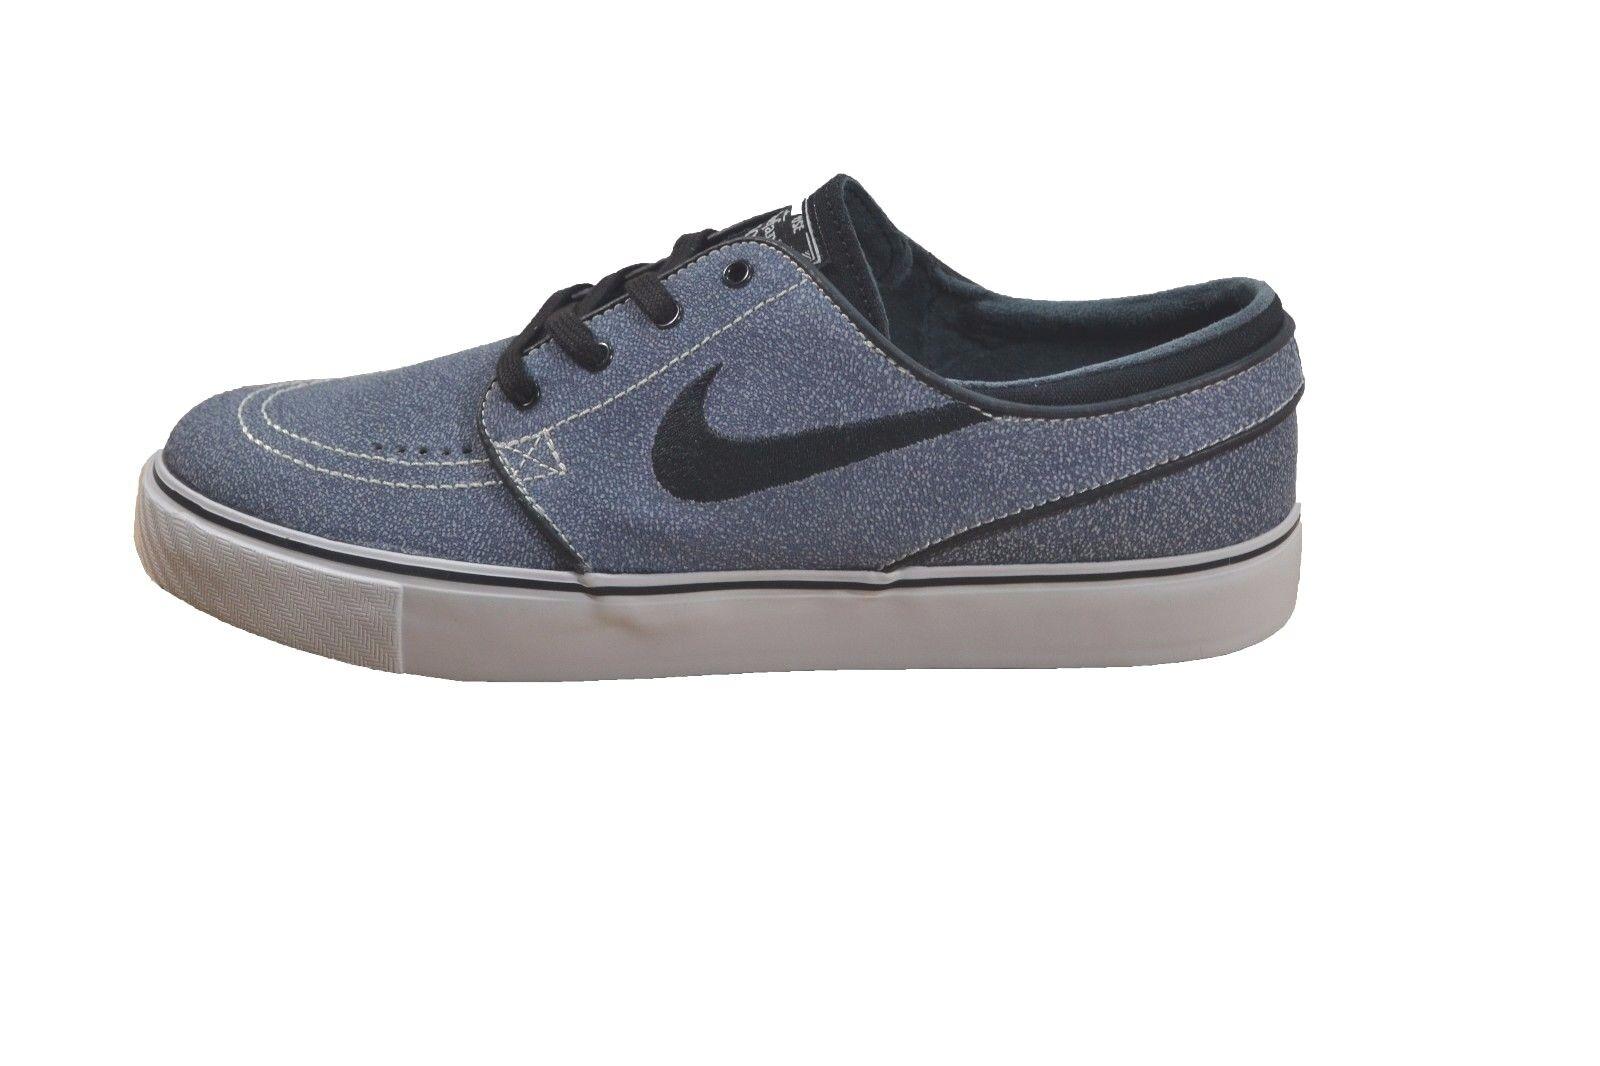 Nike ZOOM STEFAN JANOSKI Sail Black Light Ash Grey Price reduction Men's Shoes